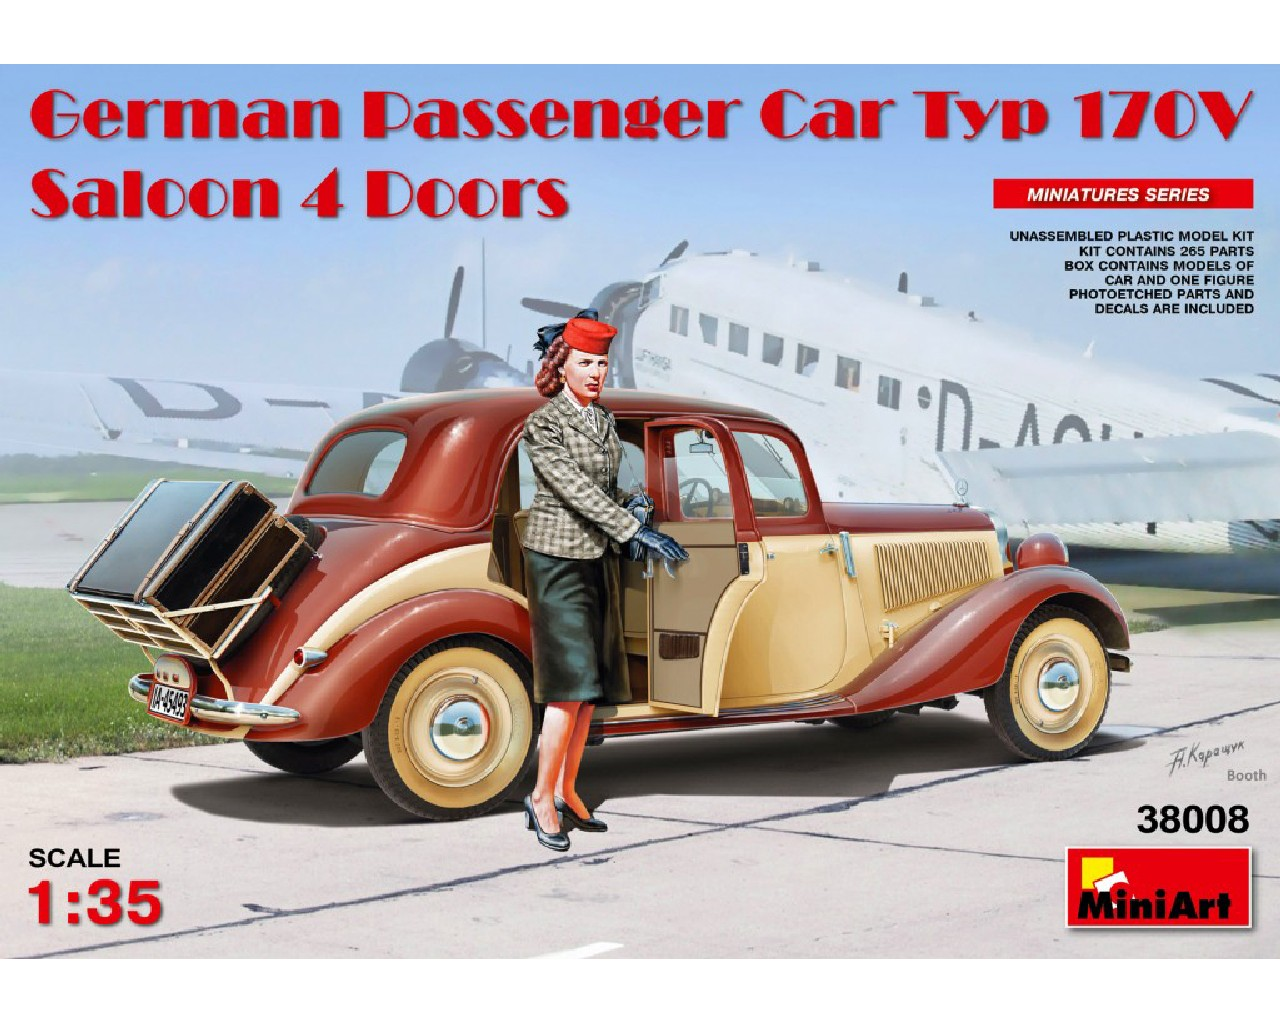 1/35 German Passenger Car Typ 170V.Saloon 4 Doors